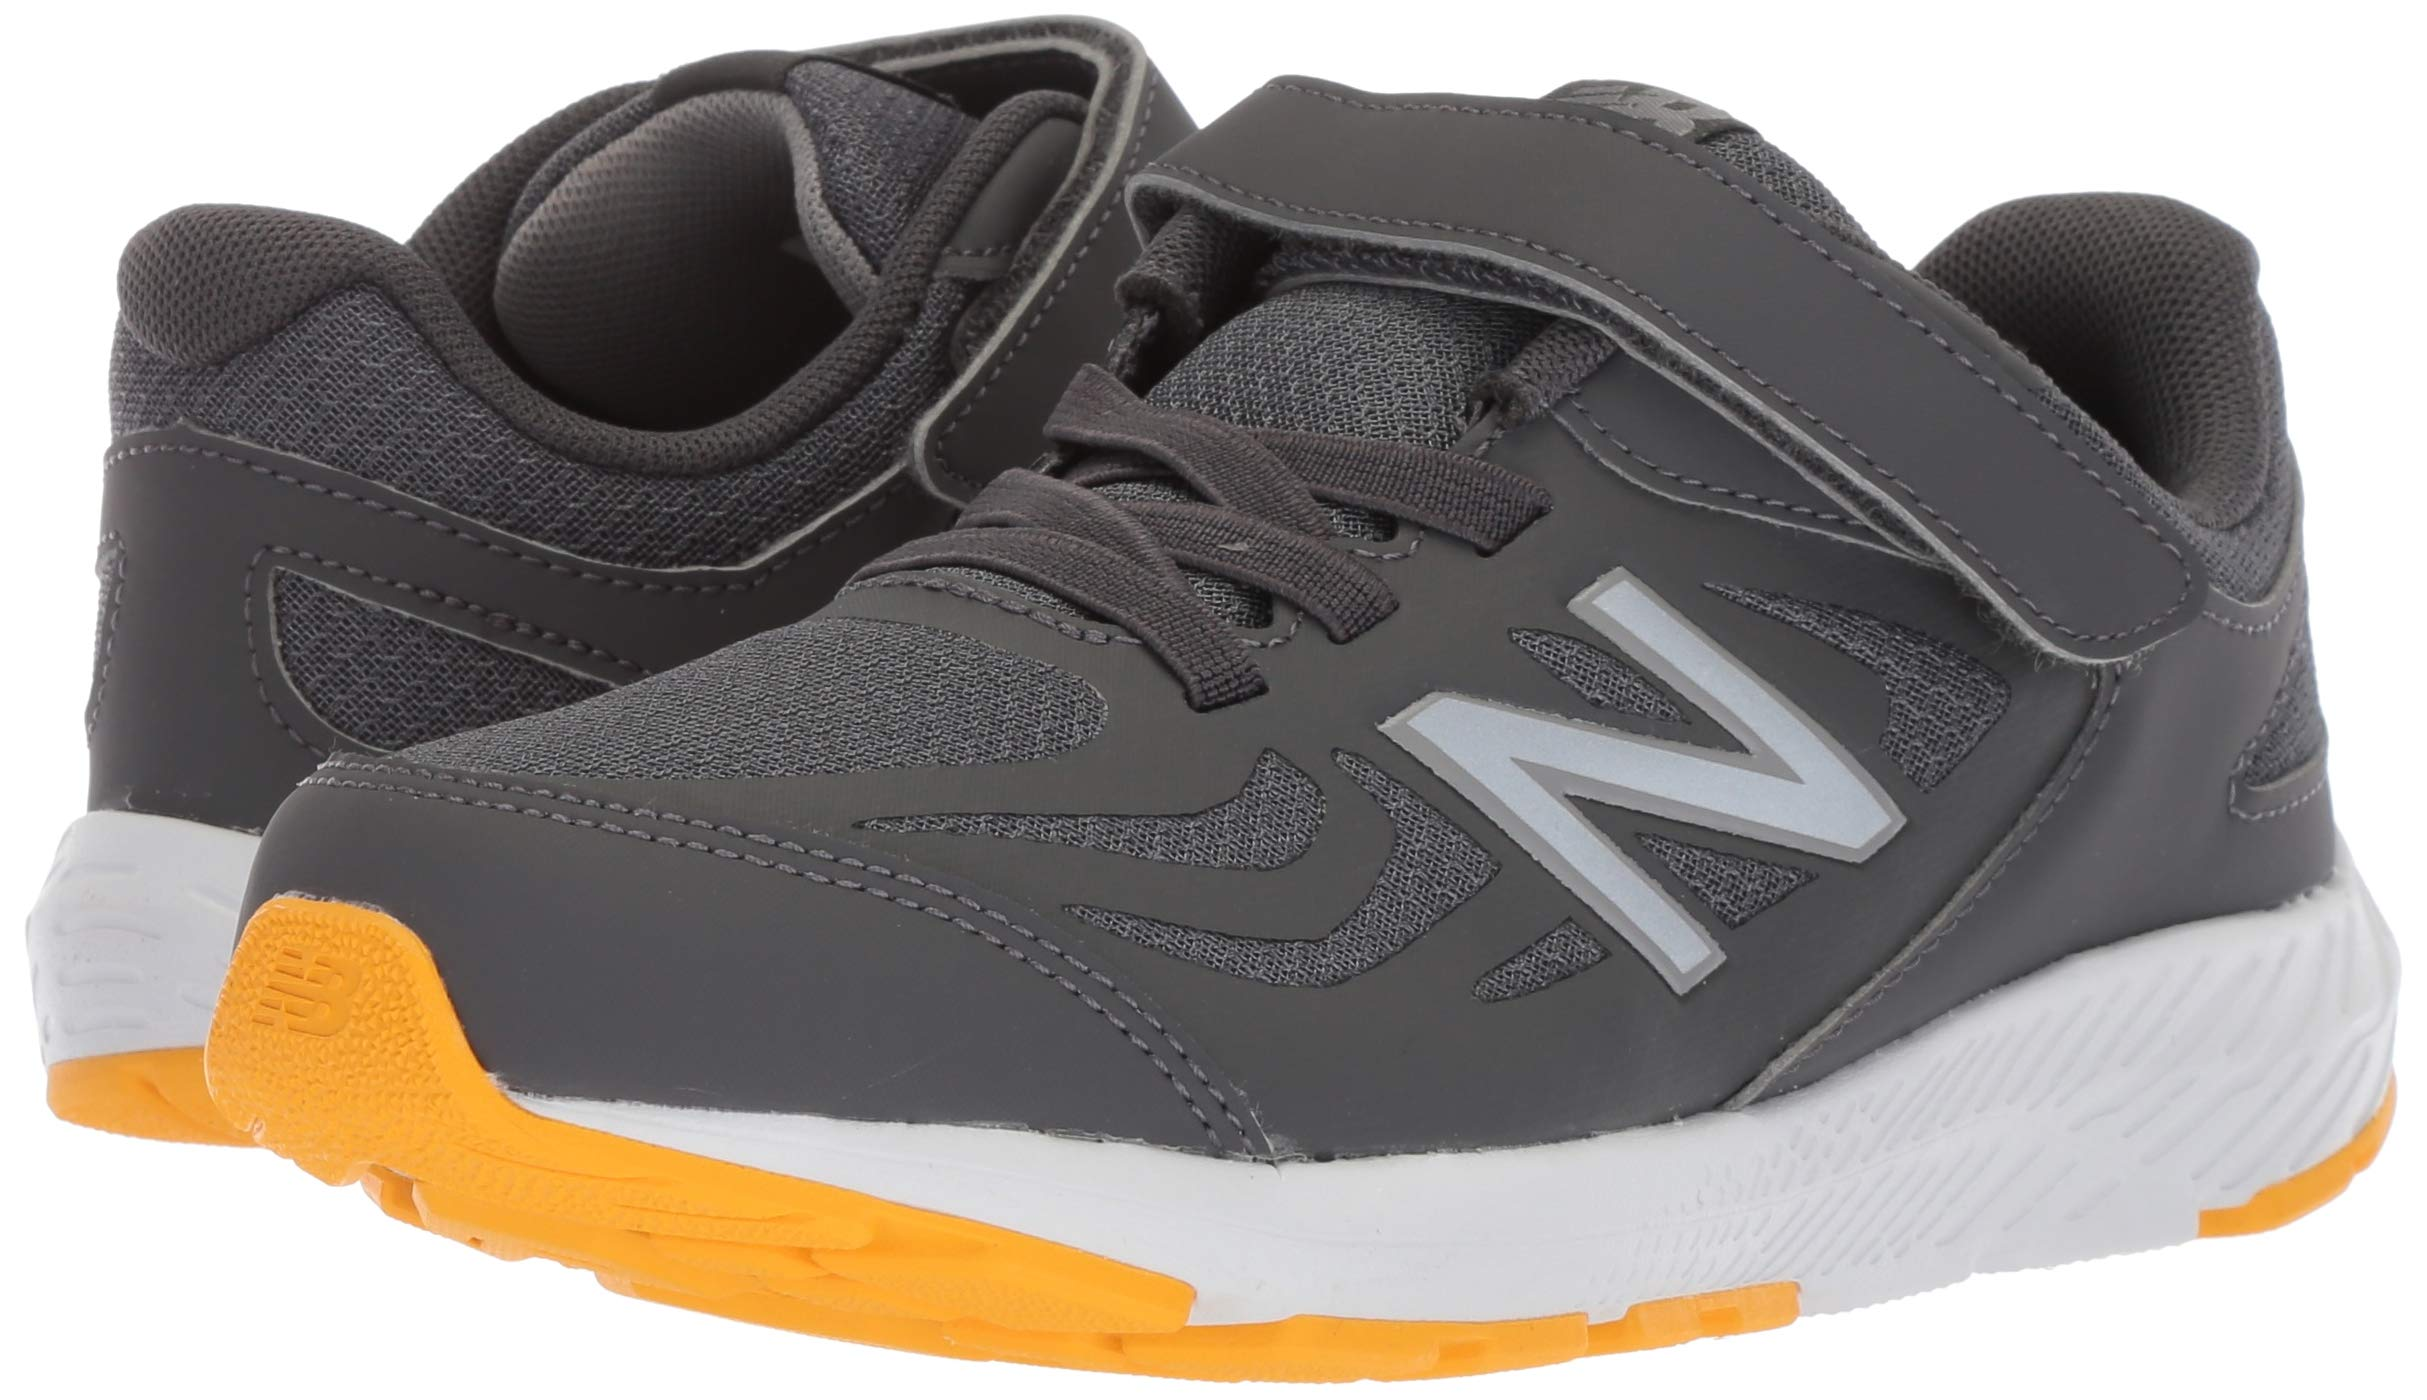 New Balance Boys' 519v1 Hook and Loop Running Shoe, Magnet/Phantom, 2 M US Infant by New Balance (Image #6)